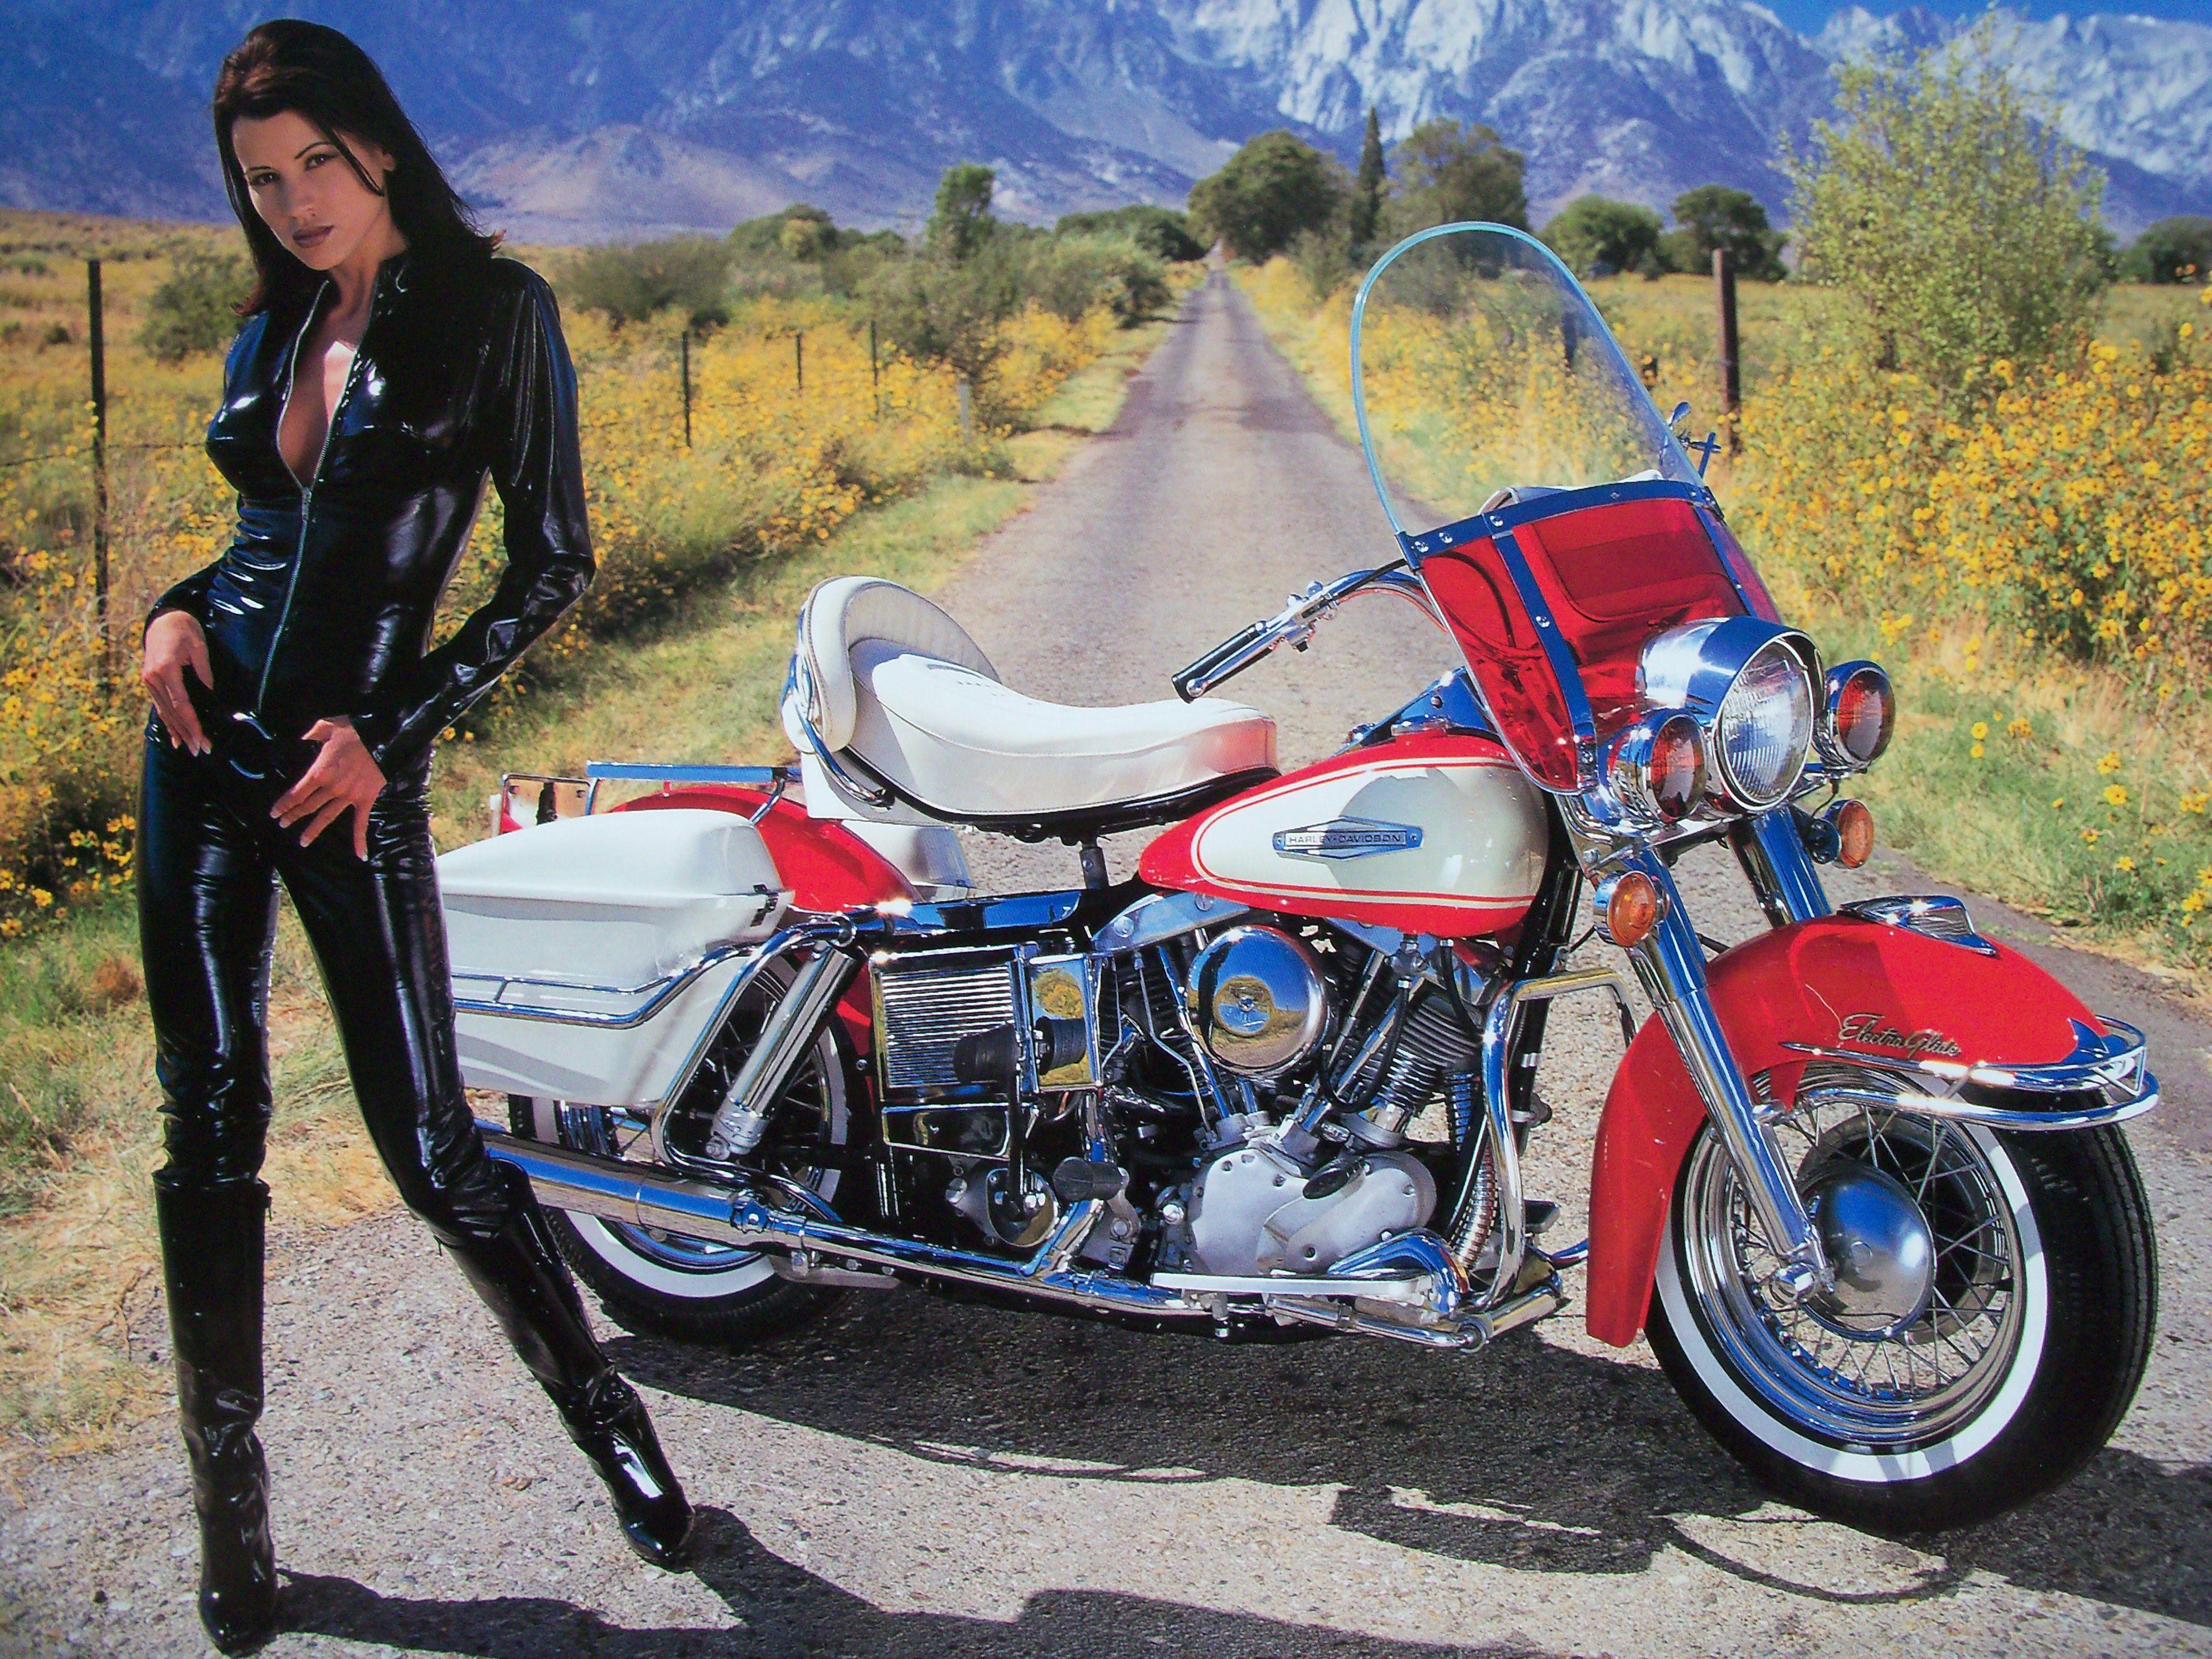 medium resolution of women motorcycle 1966 harley davidson flh electra glide davidson flh girl harley